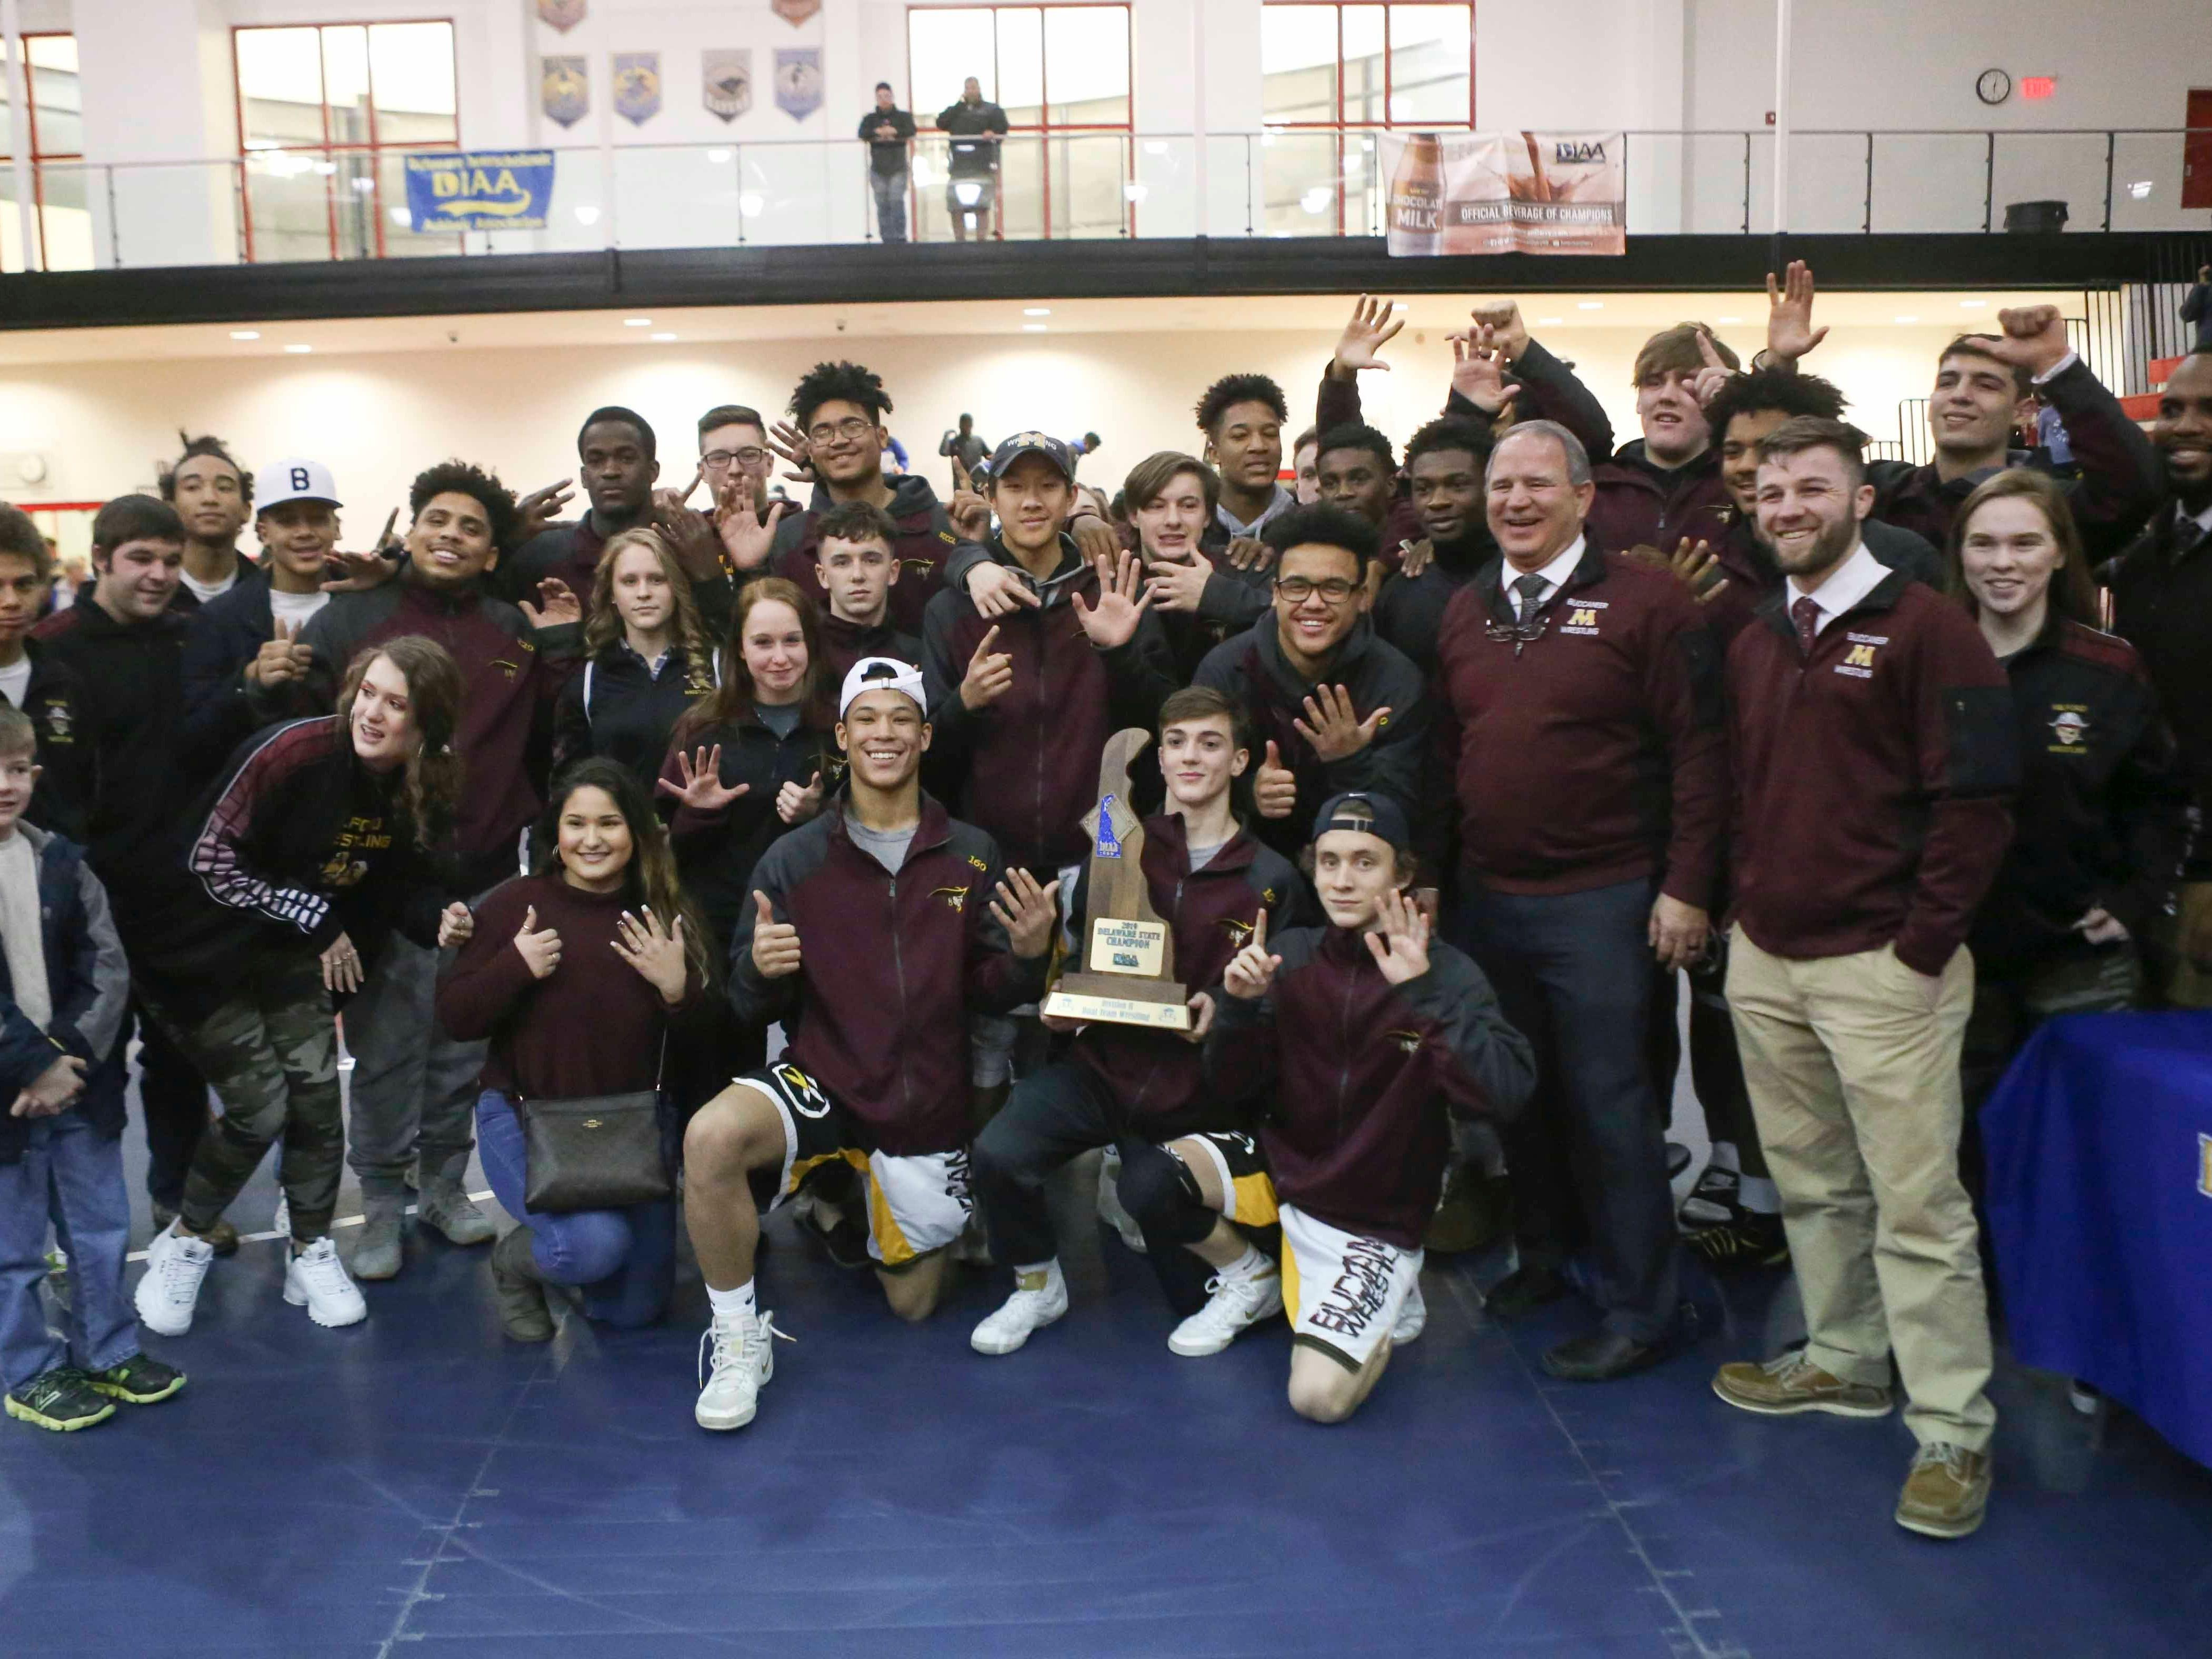 Milford celebrates its DIAA Division II team championship Saturday at Smyrna High School.